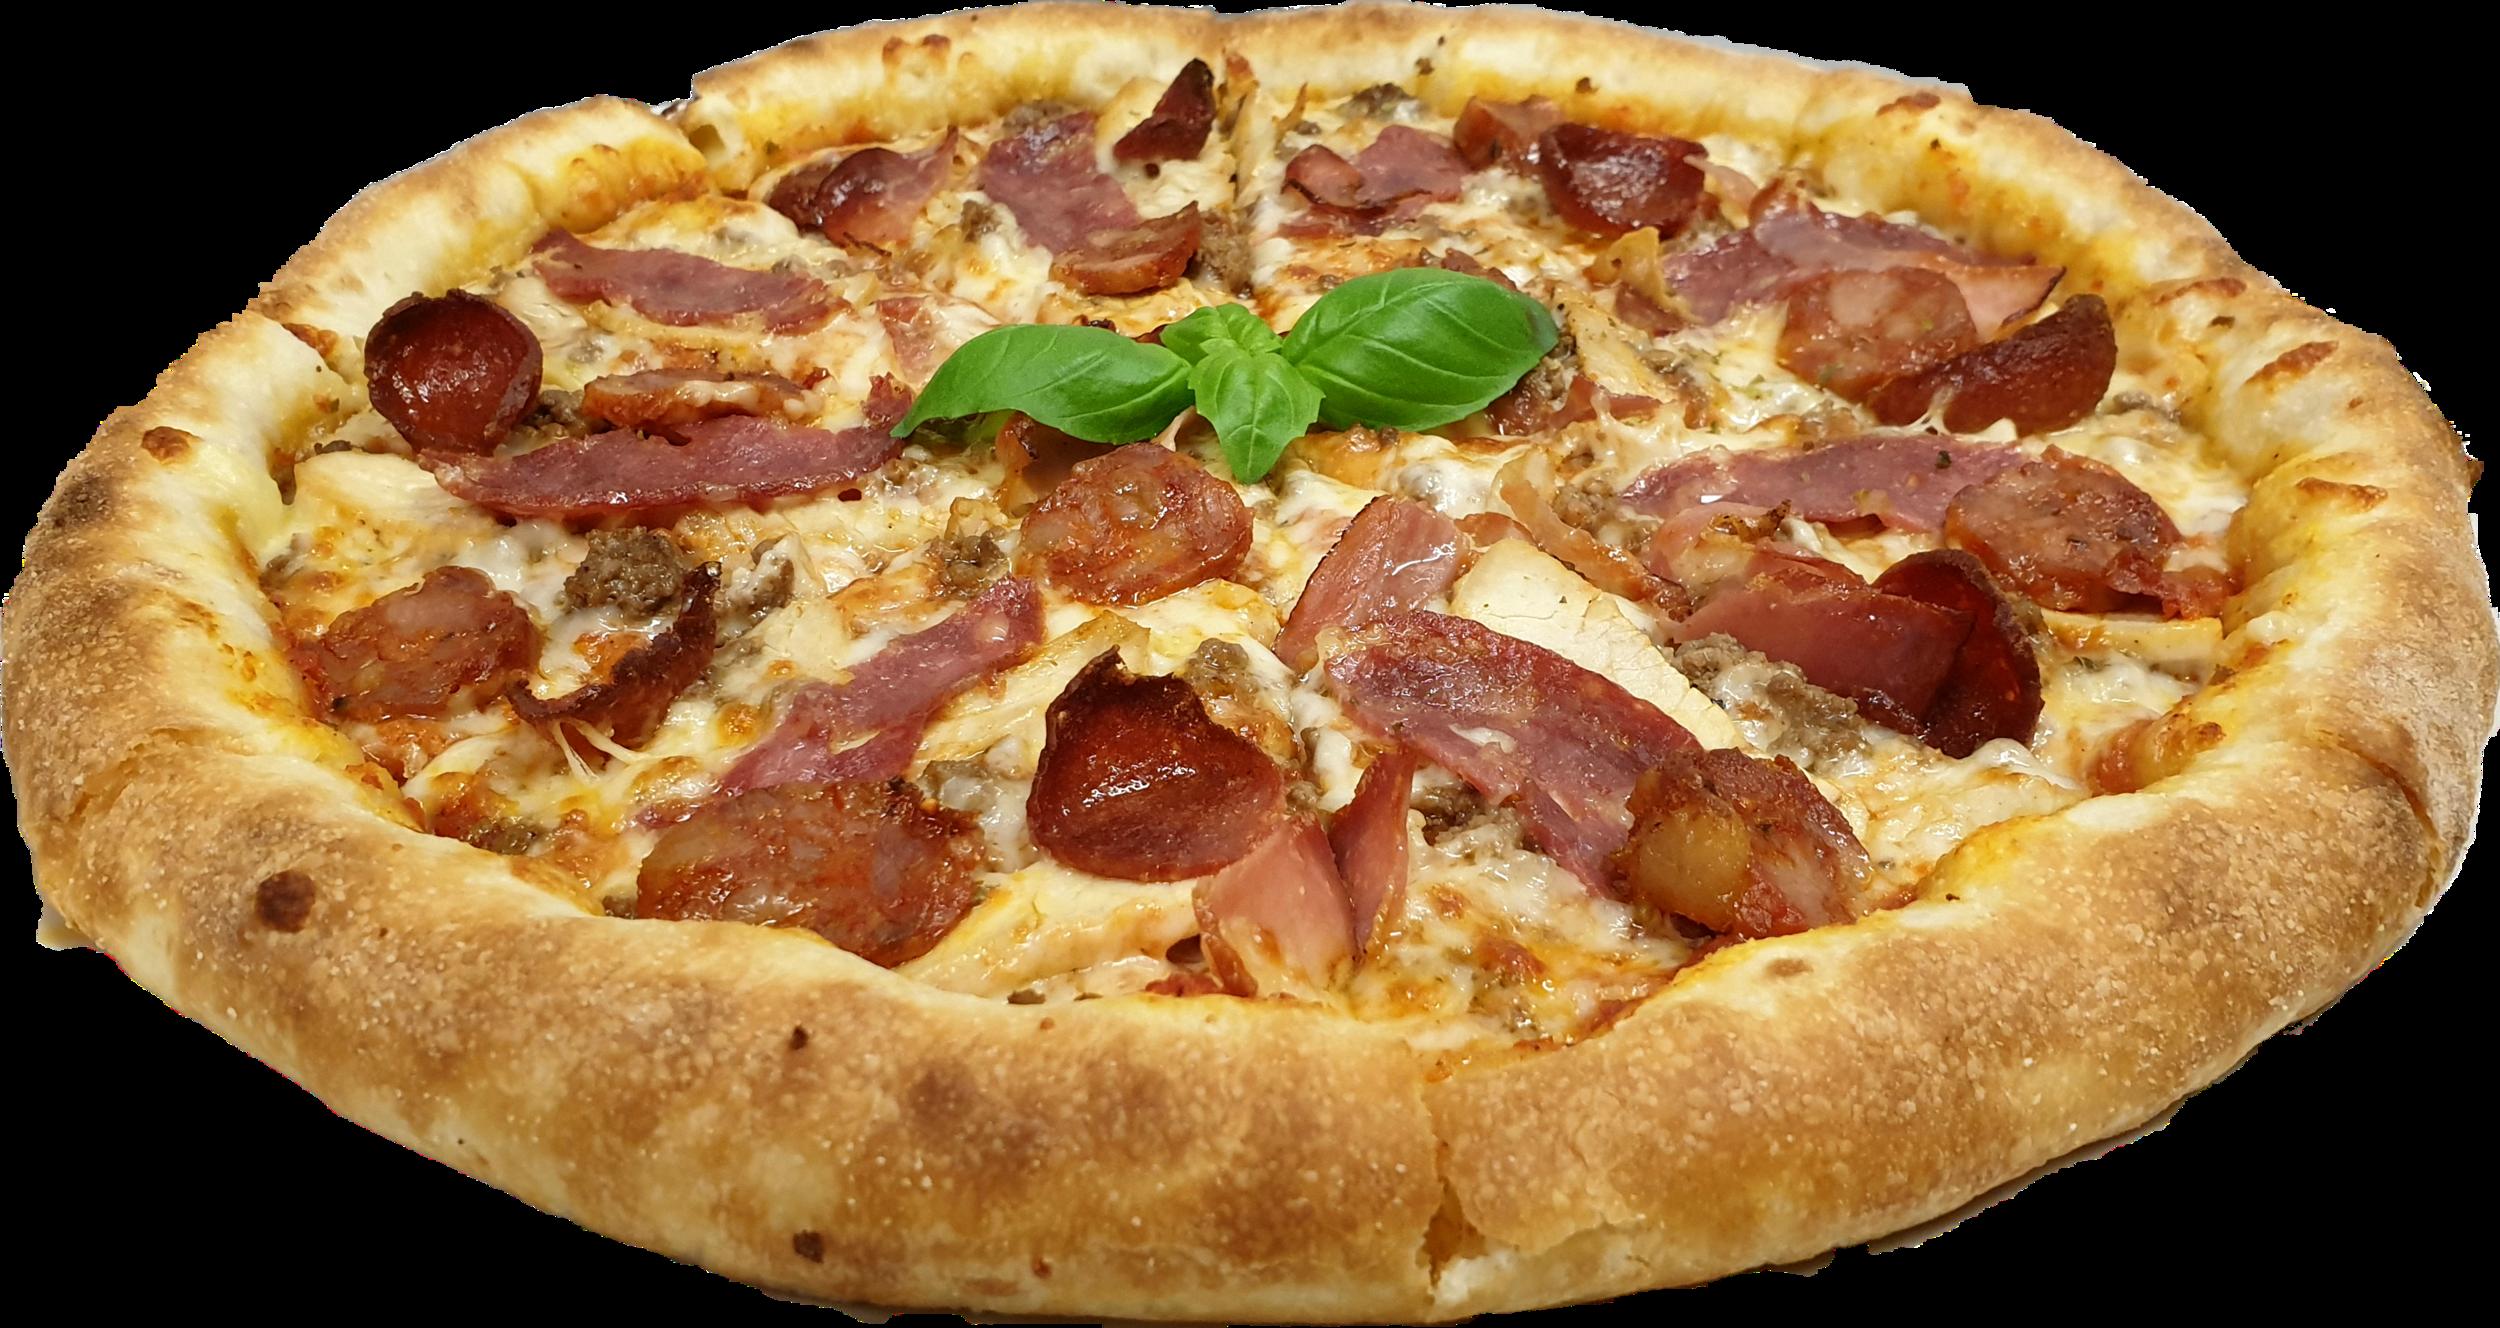 Tomatensauce, Mozzarella, frisches Rinderhackfleisch, Salami, Salsiccia, Efepasa Sucuk, Chicken, Bacon